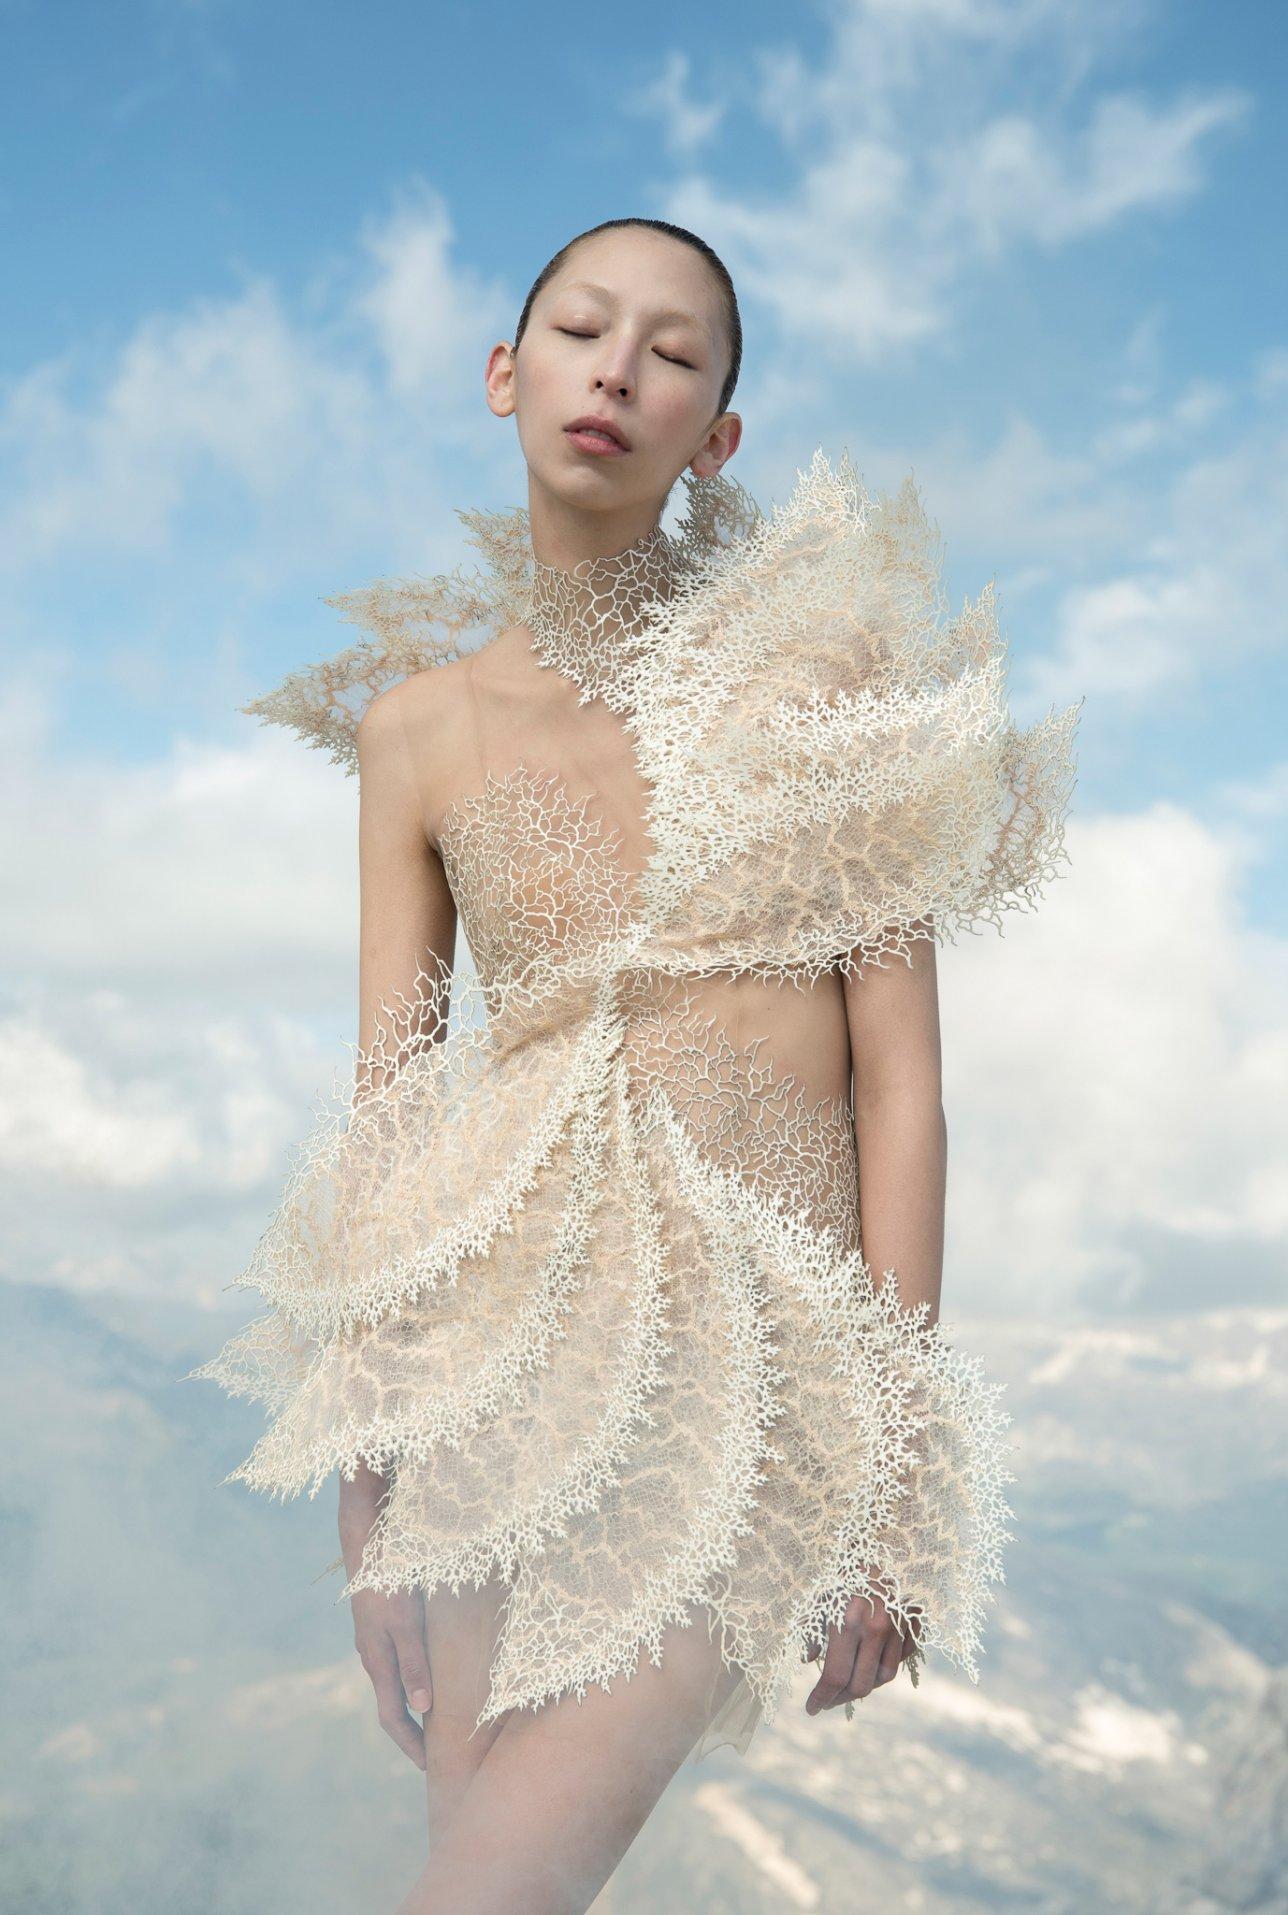 Iris-van-Herpen-AW21_22-Earthrise-Photography-by-Siermond-Nicholas-Fols-X